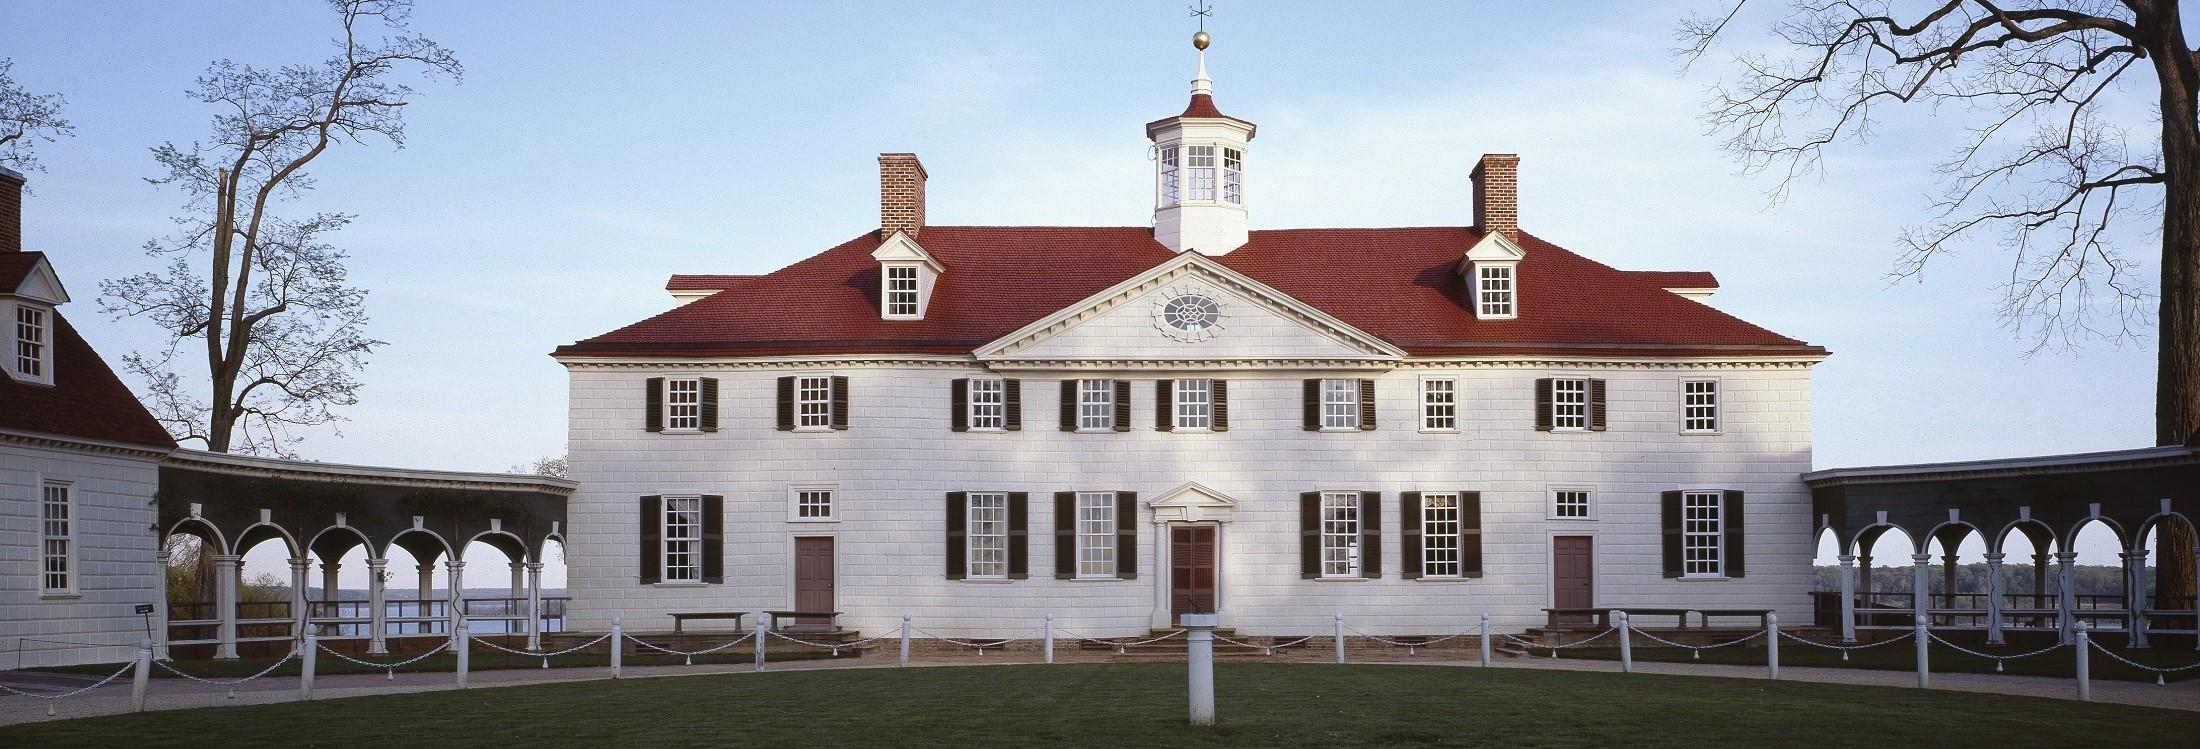 George Washington's Mount Vernon Estate in Virginia - CarDonations4Cancer.org